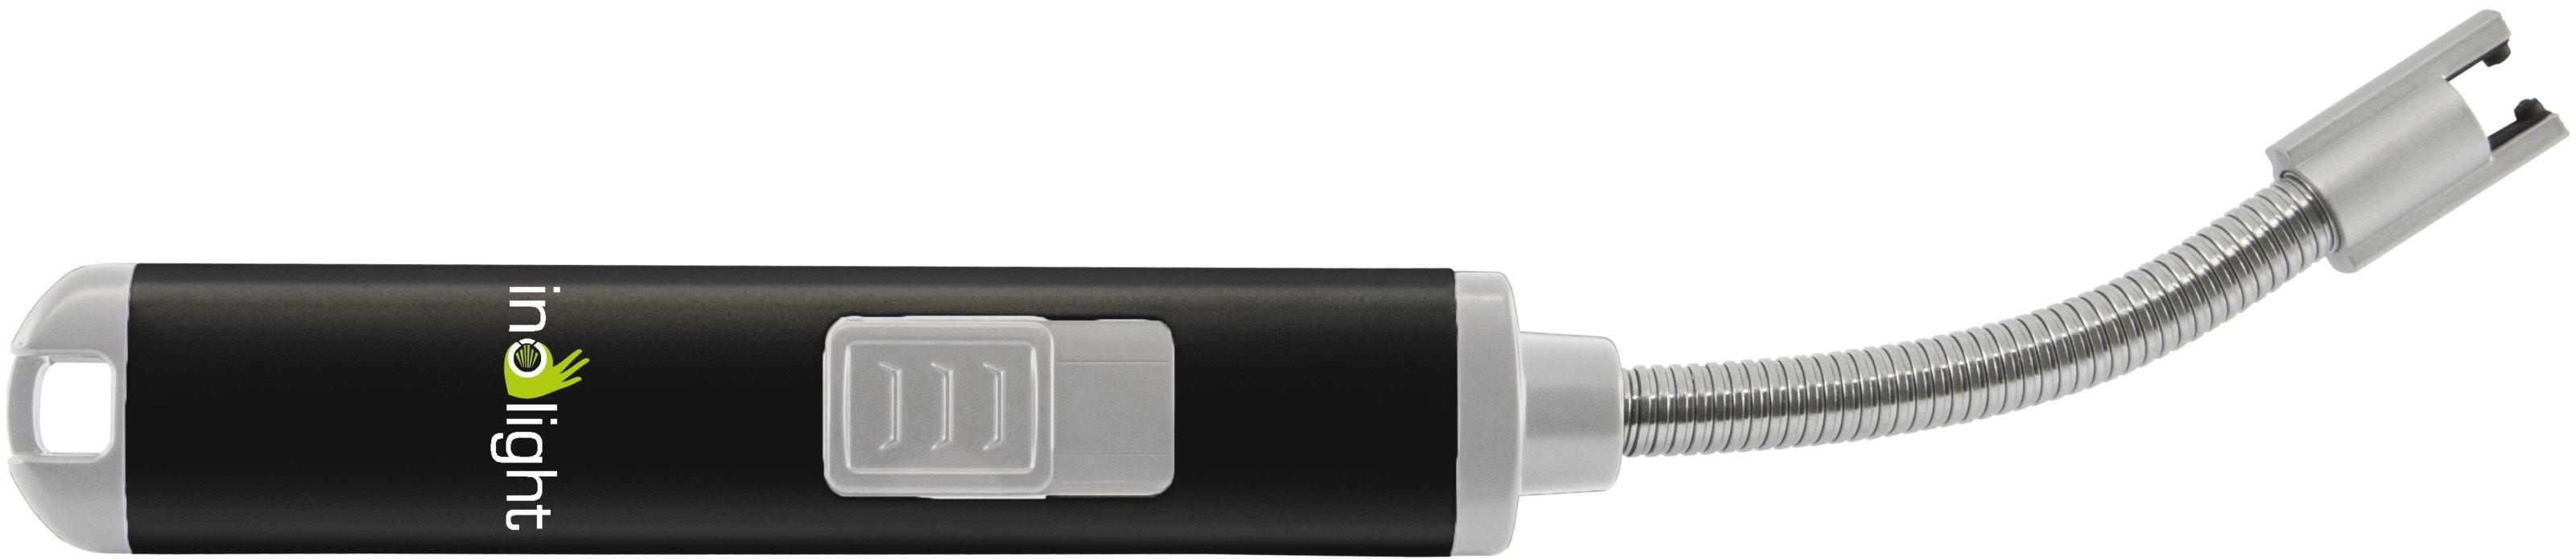 Telestar CL 1 - Spark Küchenanzünder - Akku - Schwarz - Silber - 25 mm - 15 mm - 235 mm